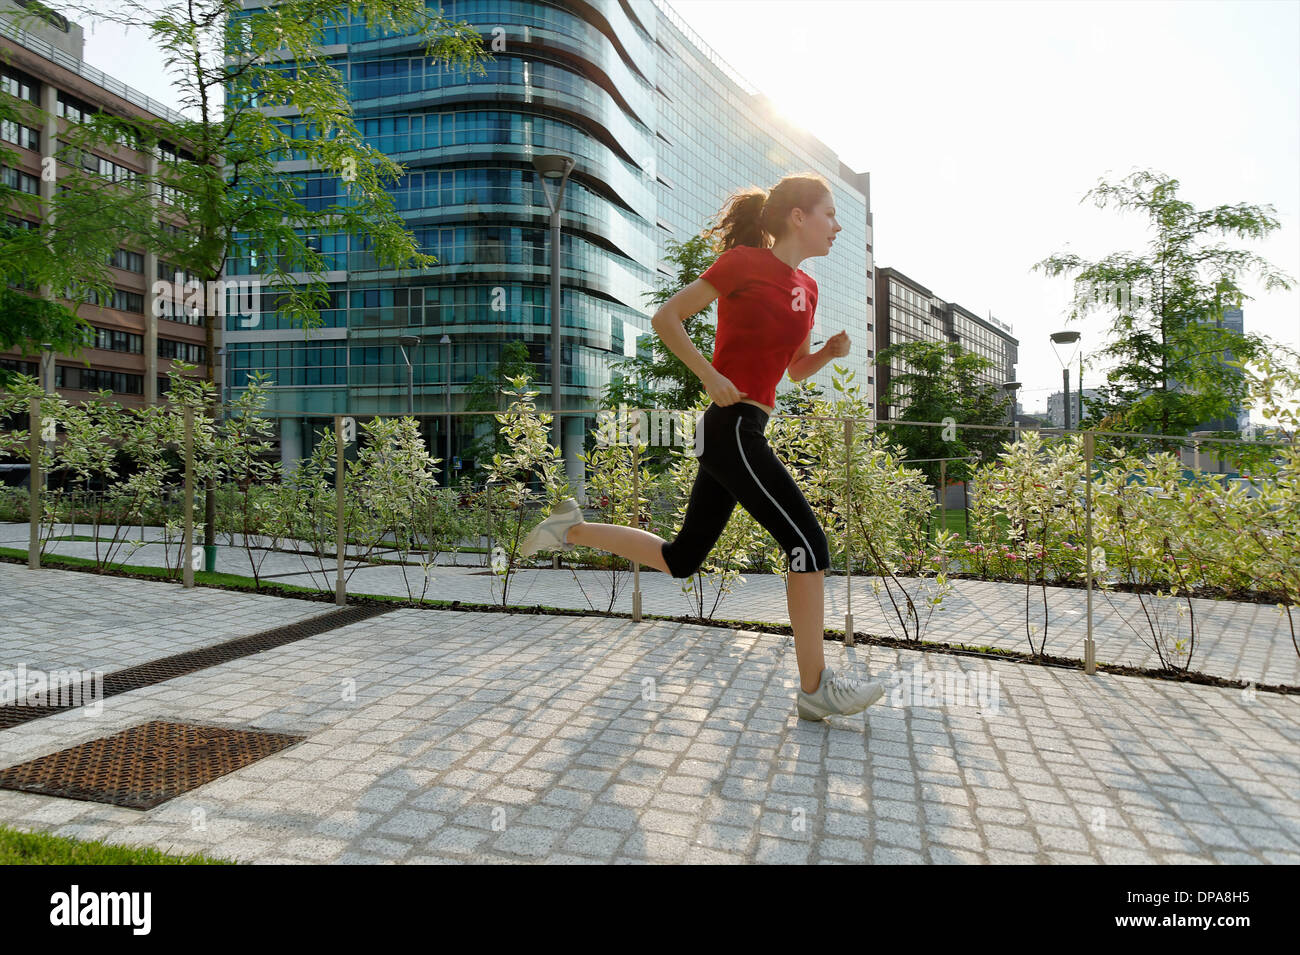 Junge Frau läuft vorbei an Bürogebäuden Stockbild